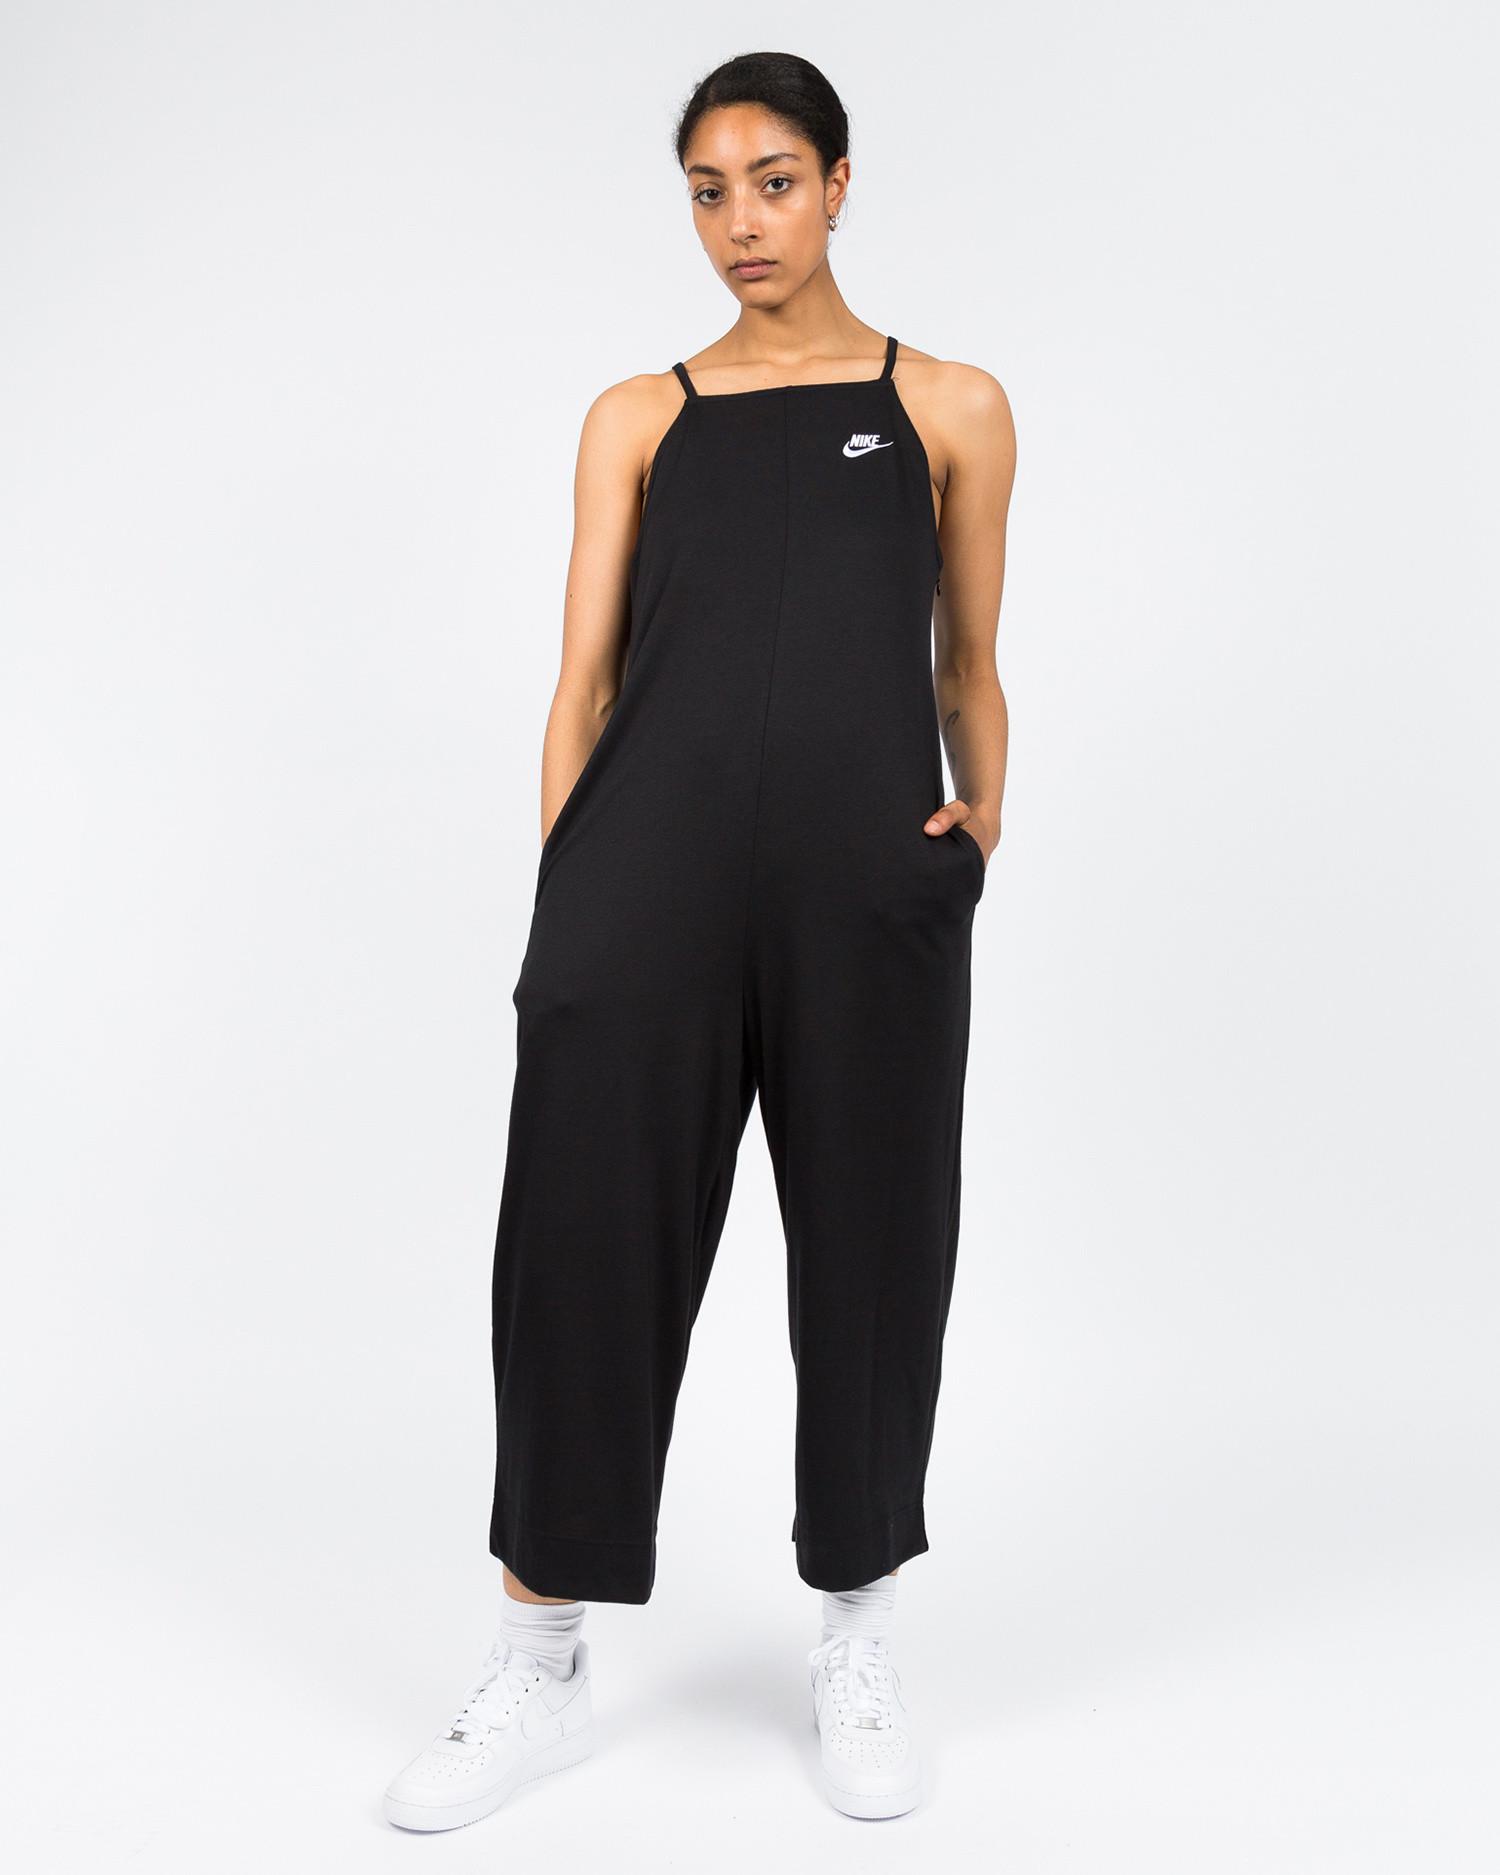 Nike Overall Black/Black/White